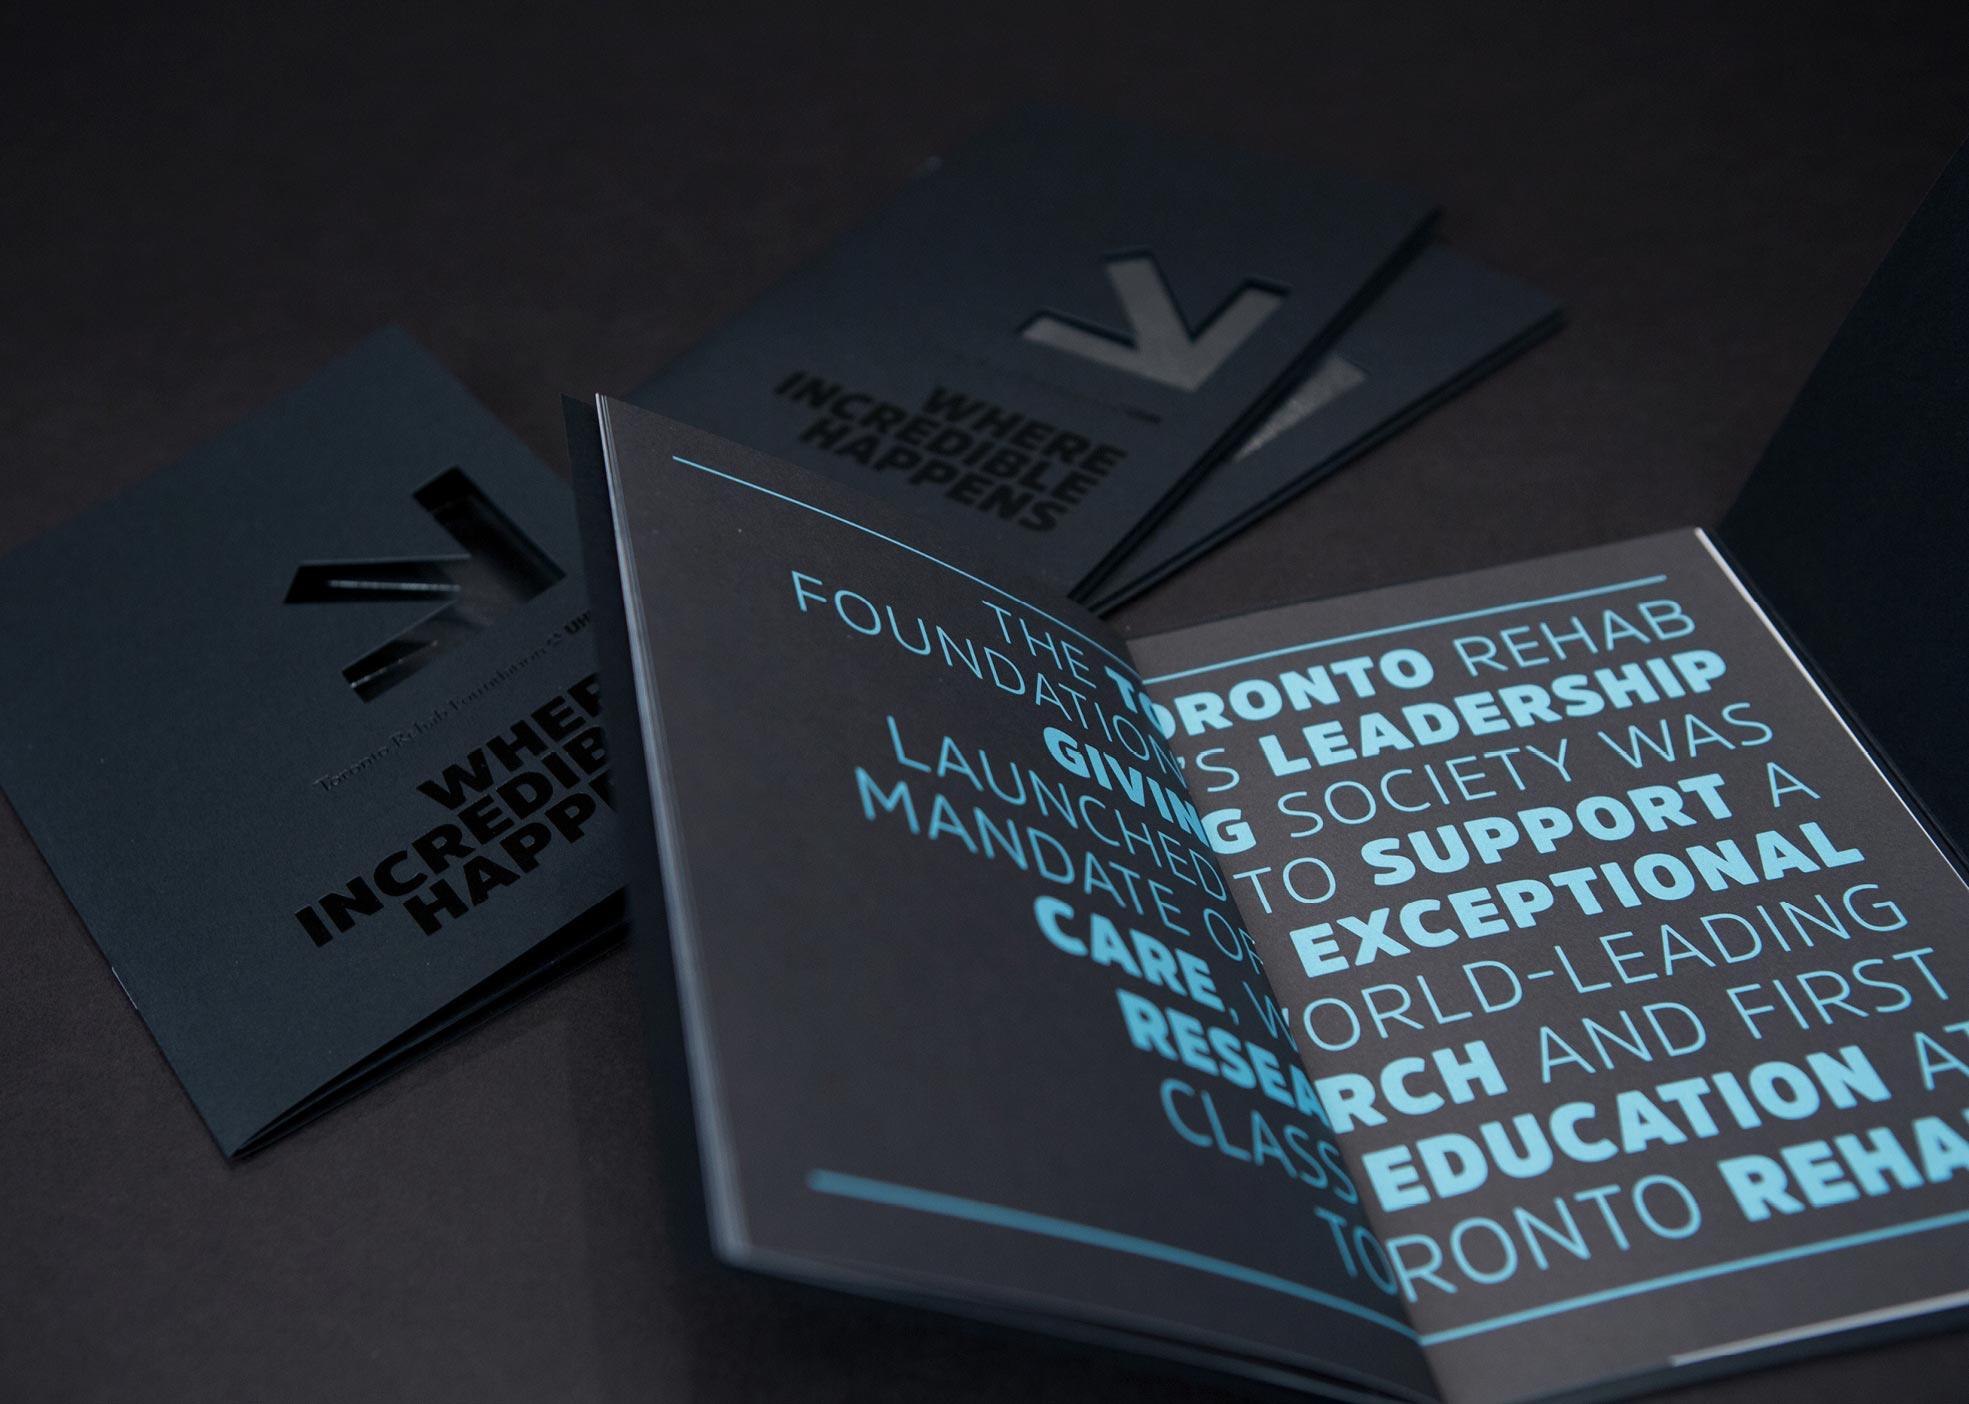 toronto-rehab-foundation-special-gifts-5-sputnik-design-partners.jpg